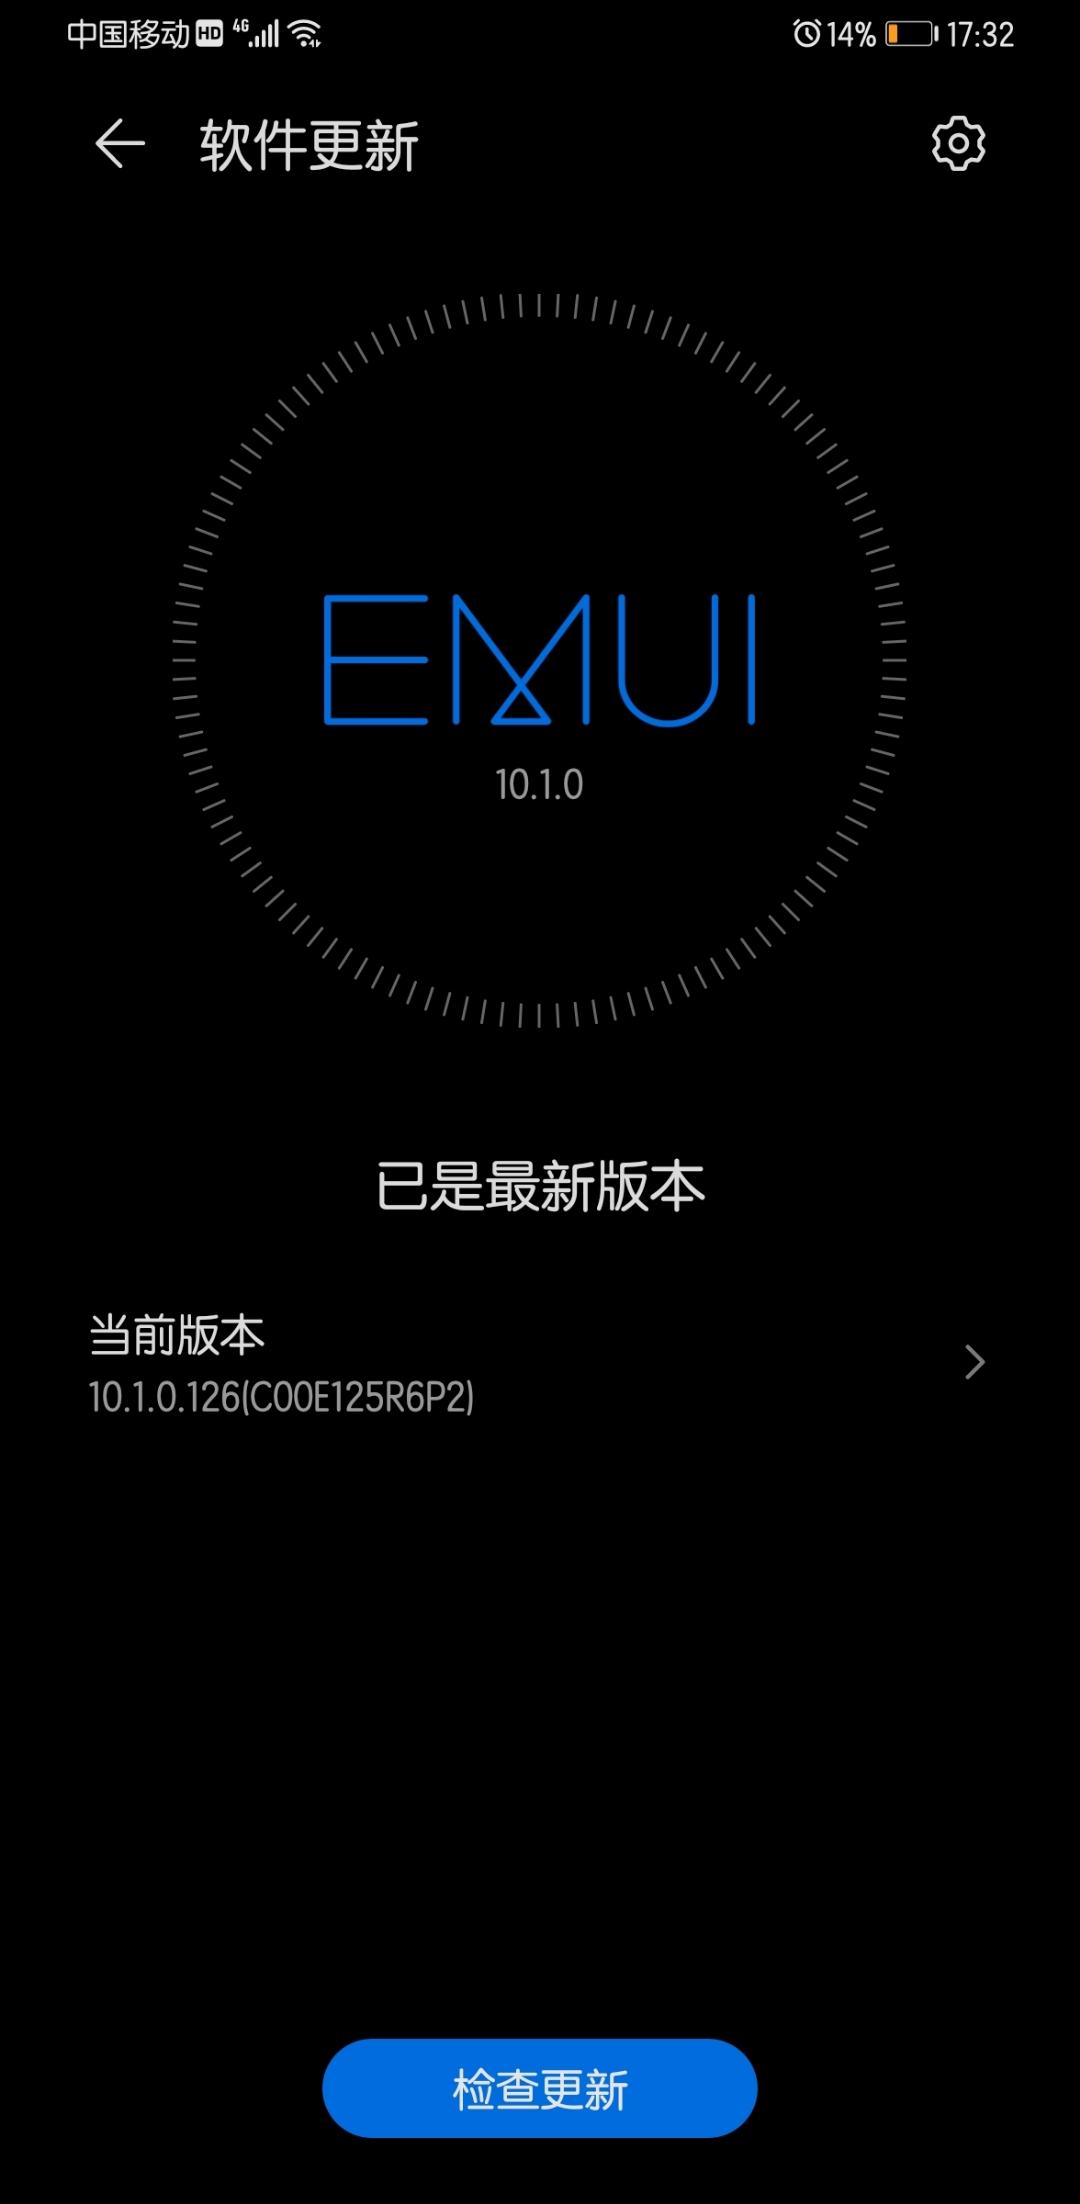 Screenshot_20200513_173246_com.huawei.android.hwouc.jpg